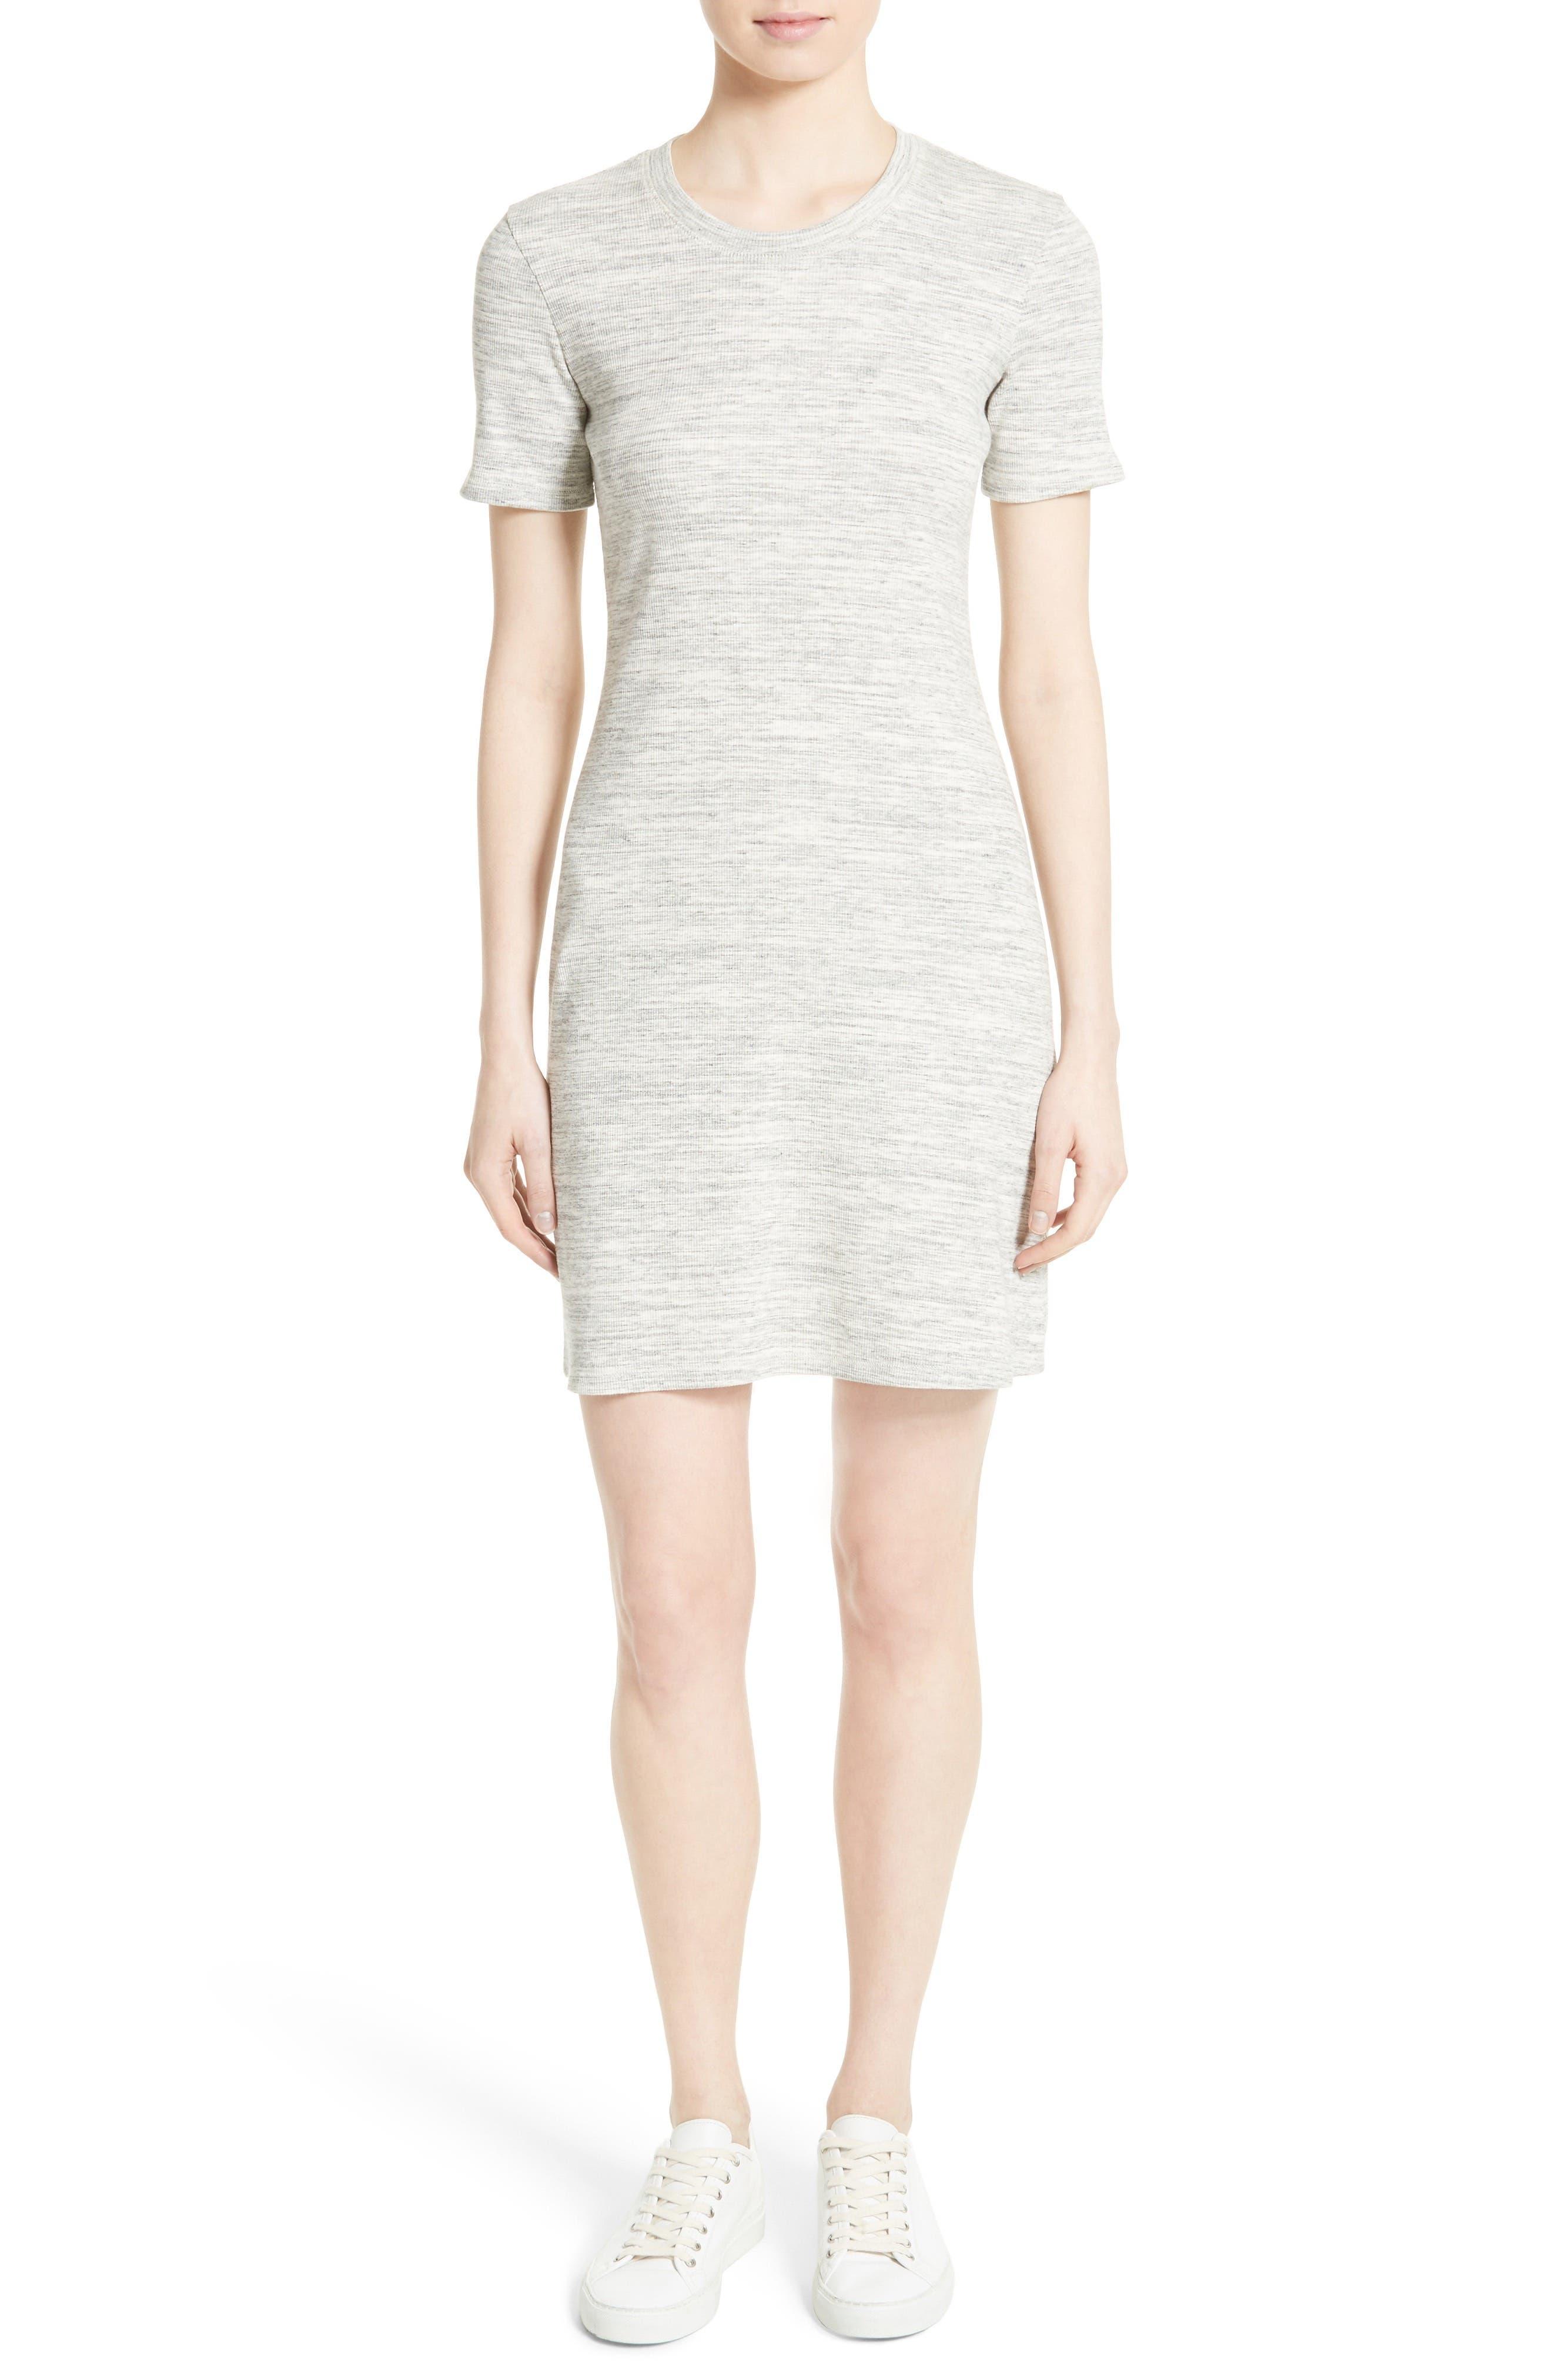 Alternate Image 1 Selected - Theory Cherry B3 Sterling Rib Knit T-Shirt Dress